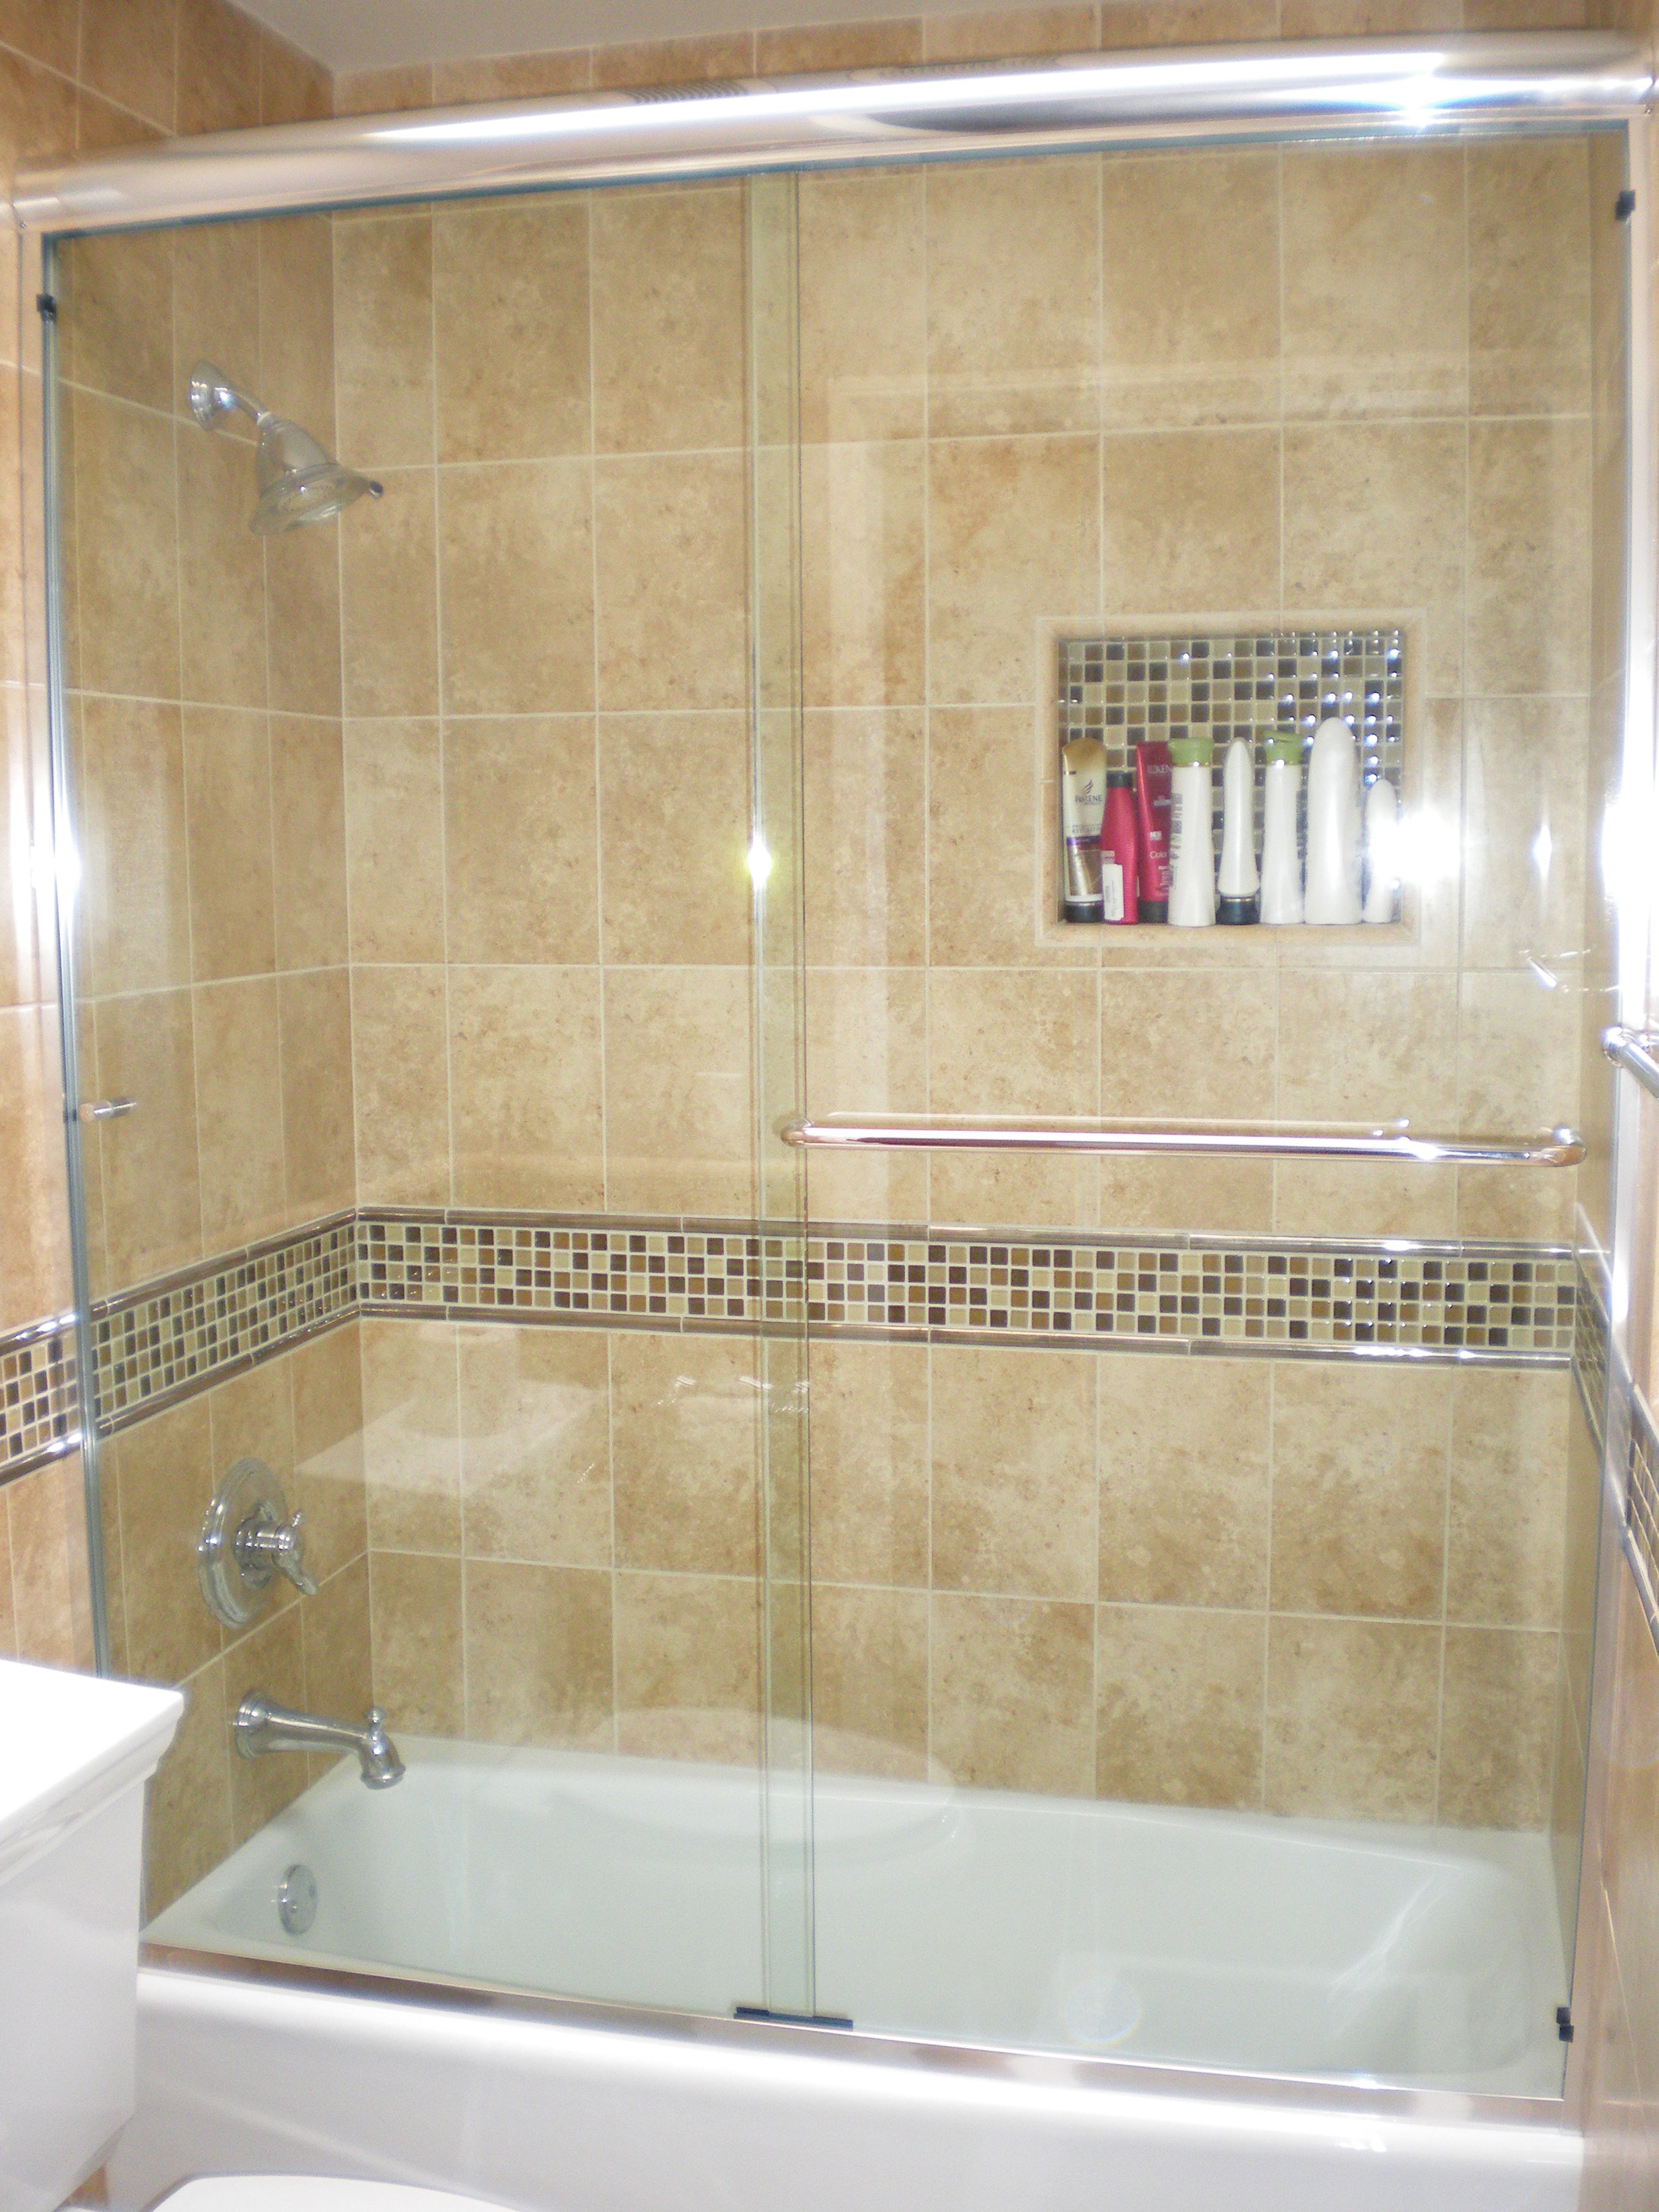 Shower-Doors-Residential-Photos-33.jpg